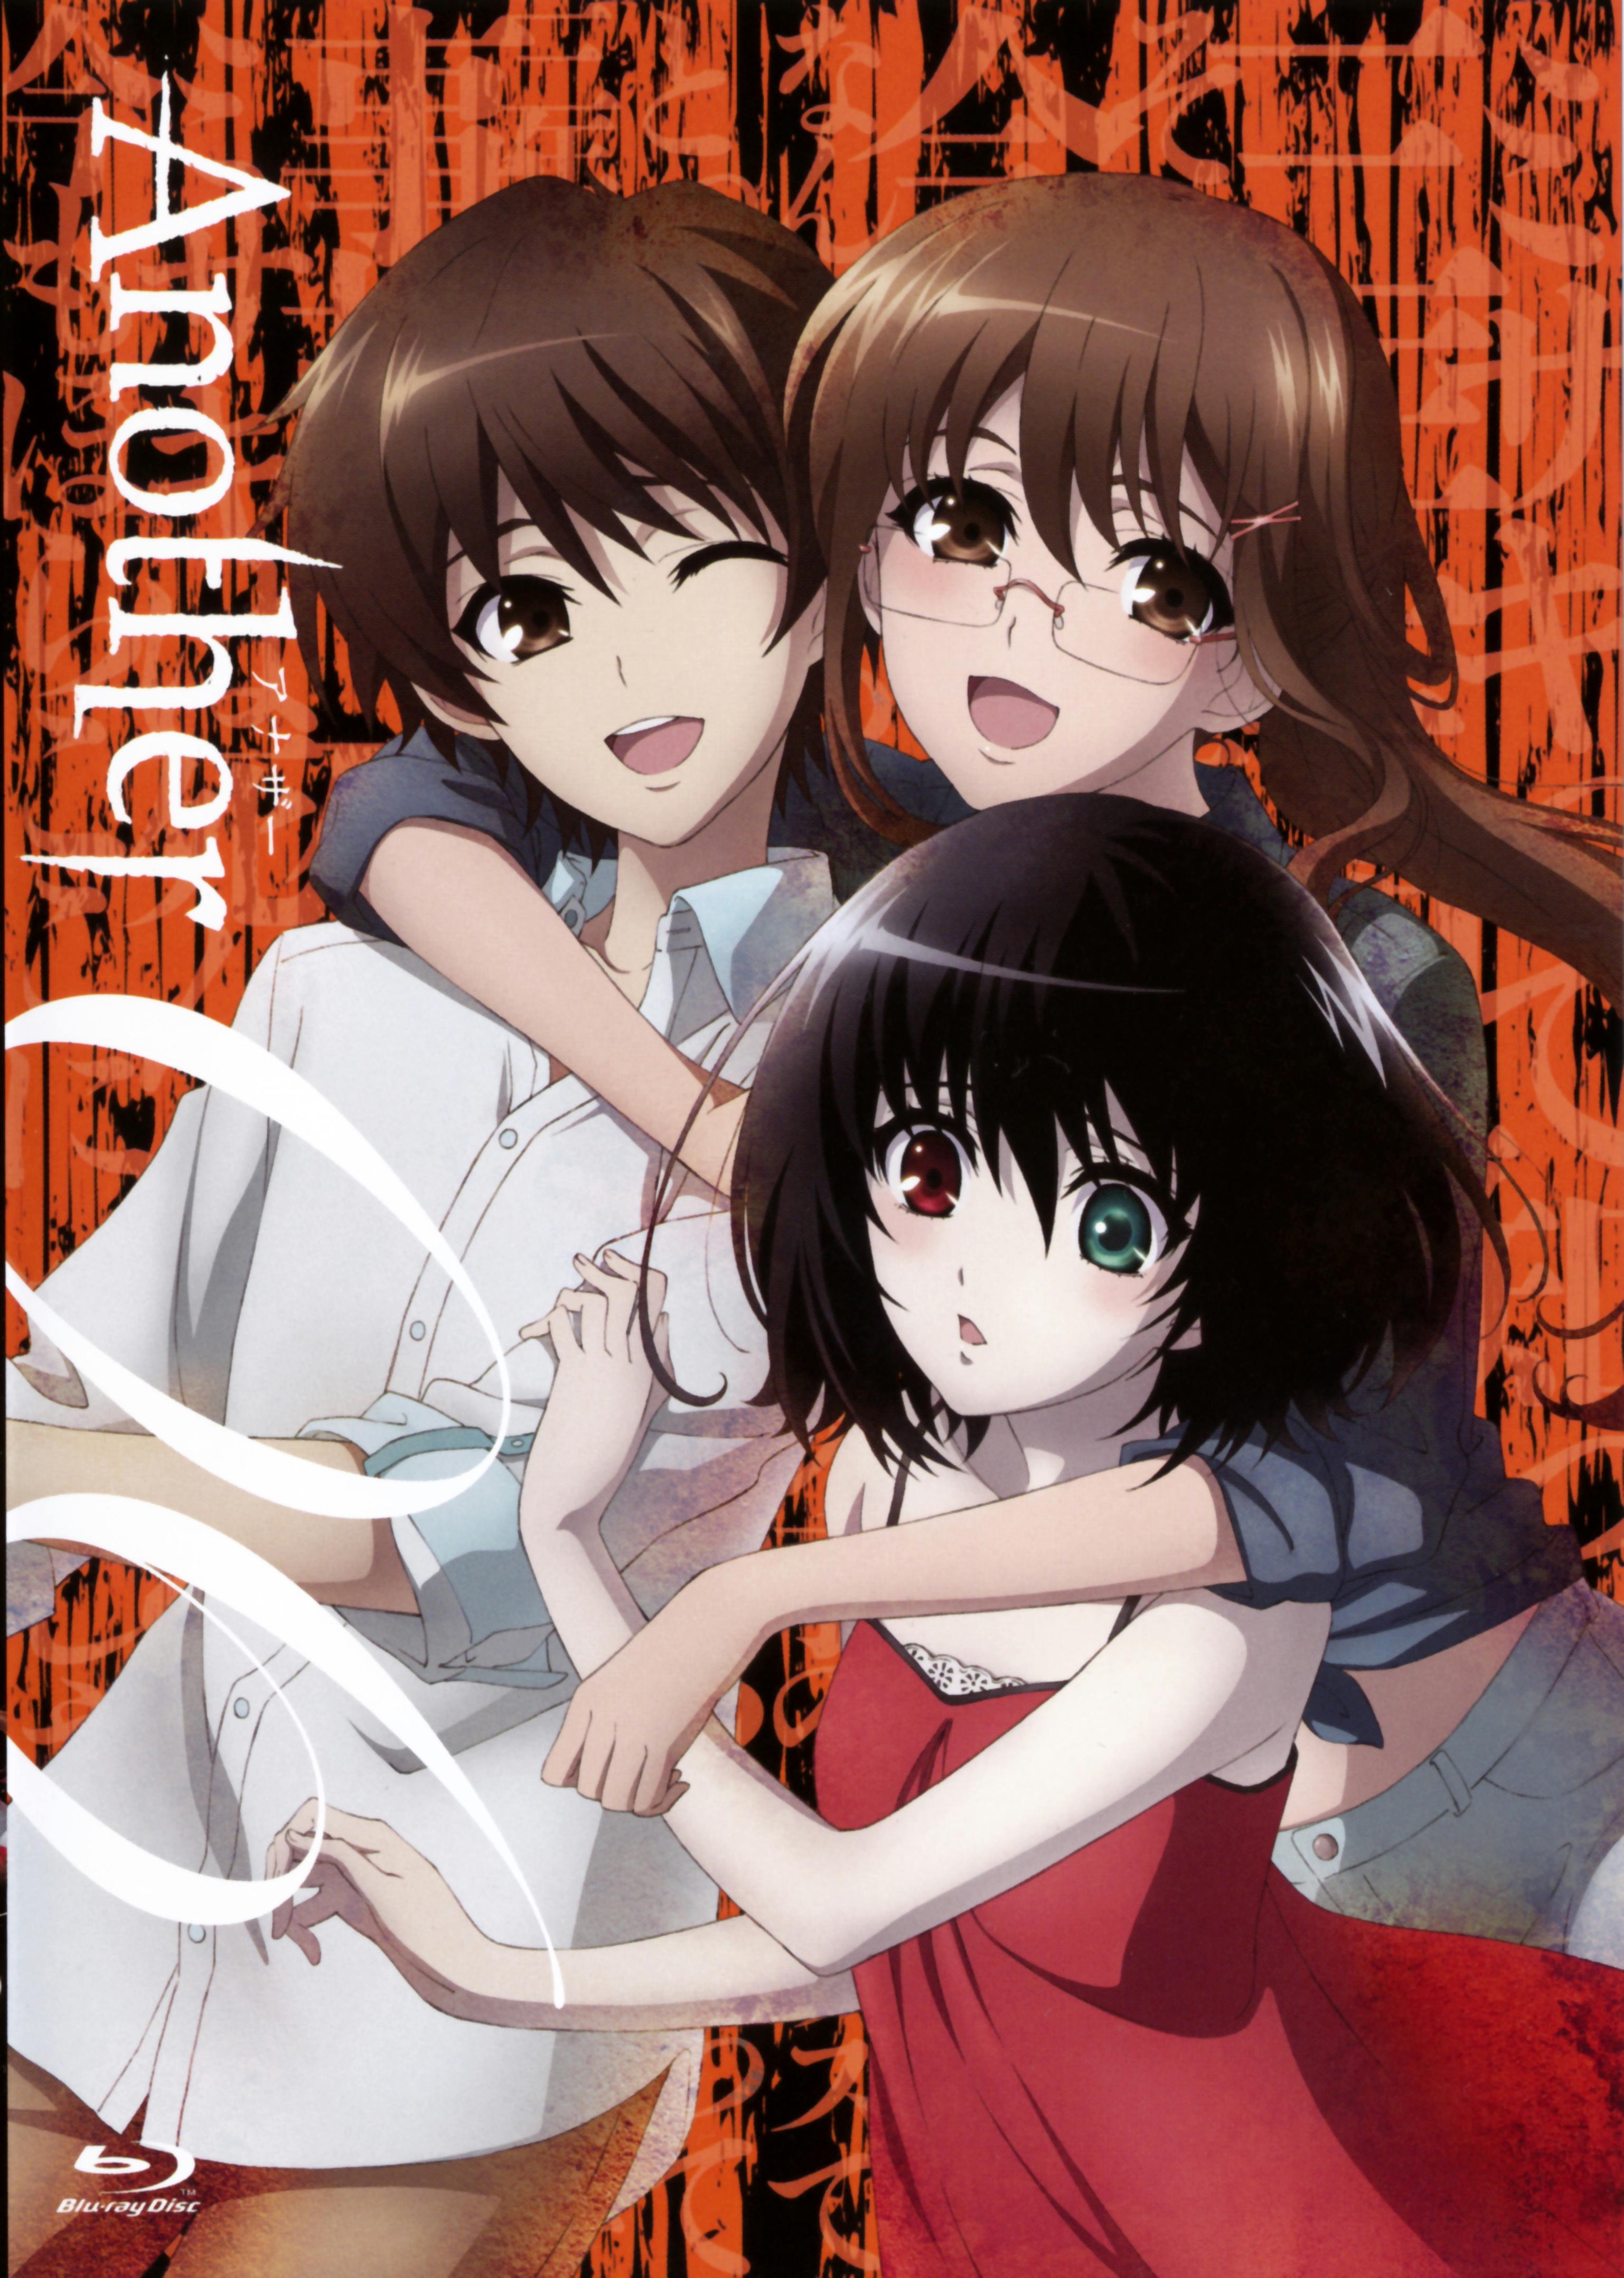 Tags anime another reiko another sakakibara kouichi misaki mei